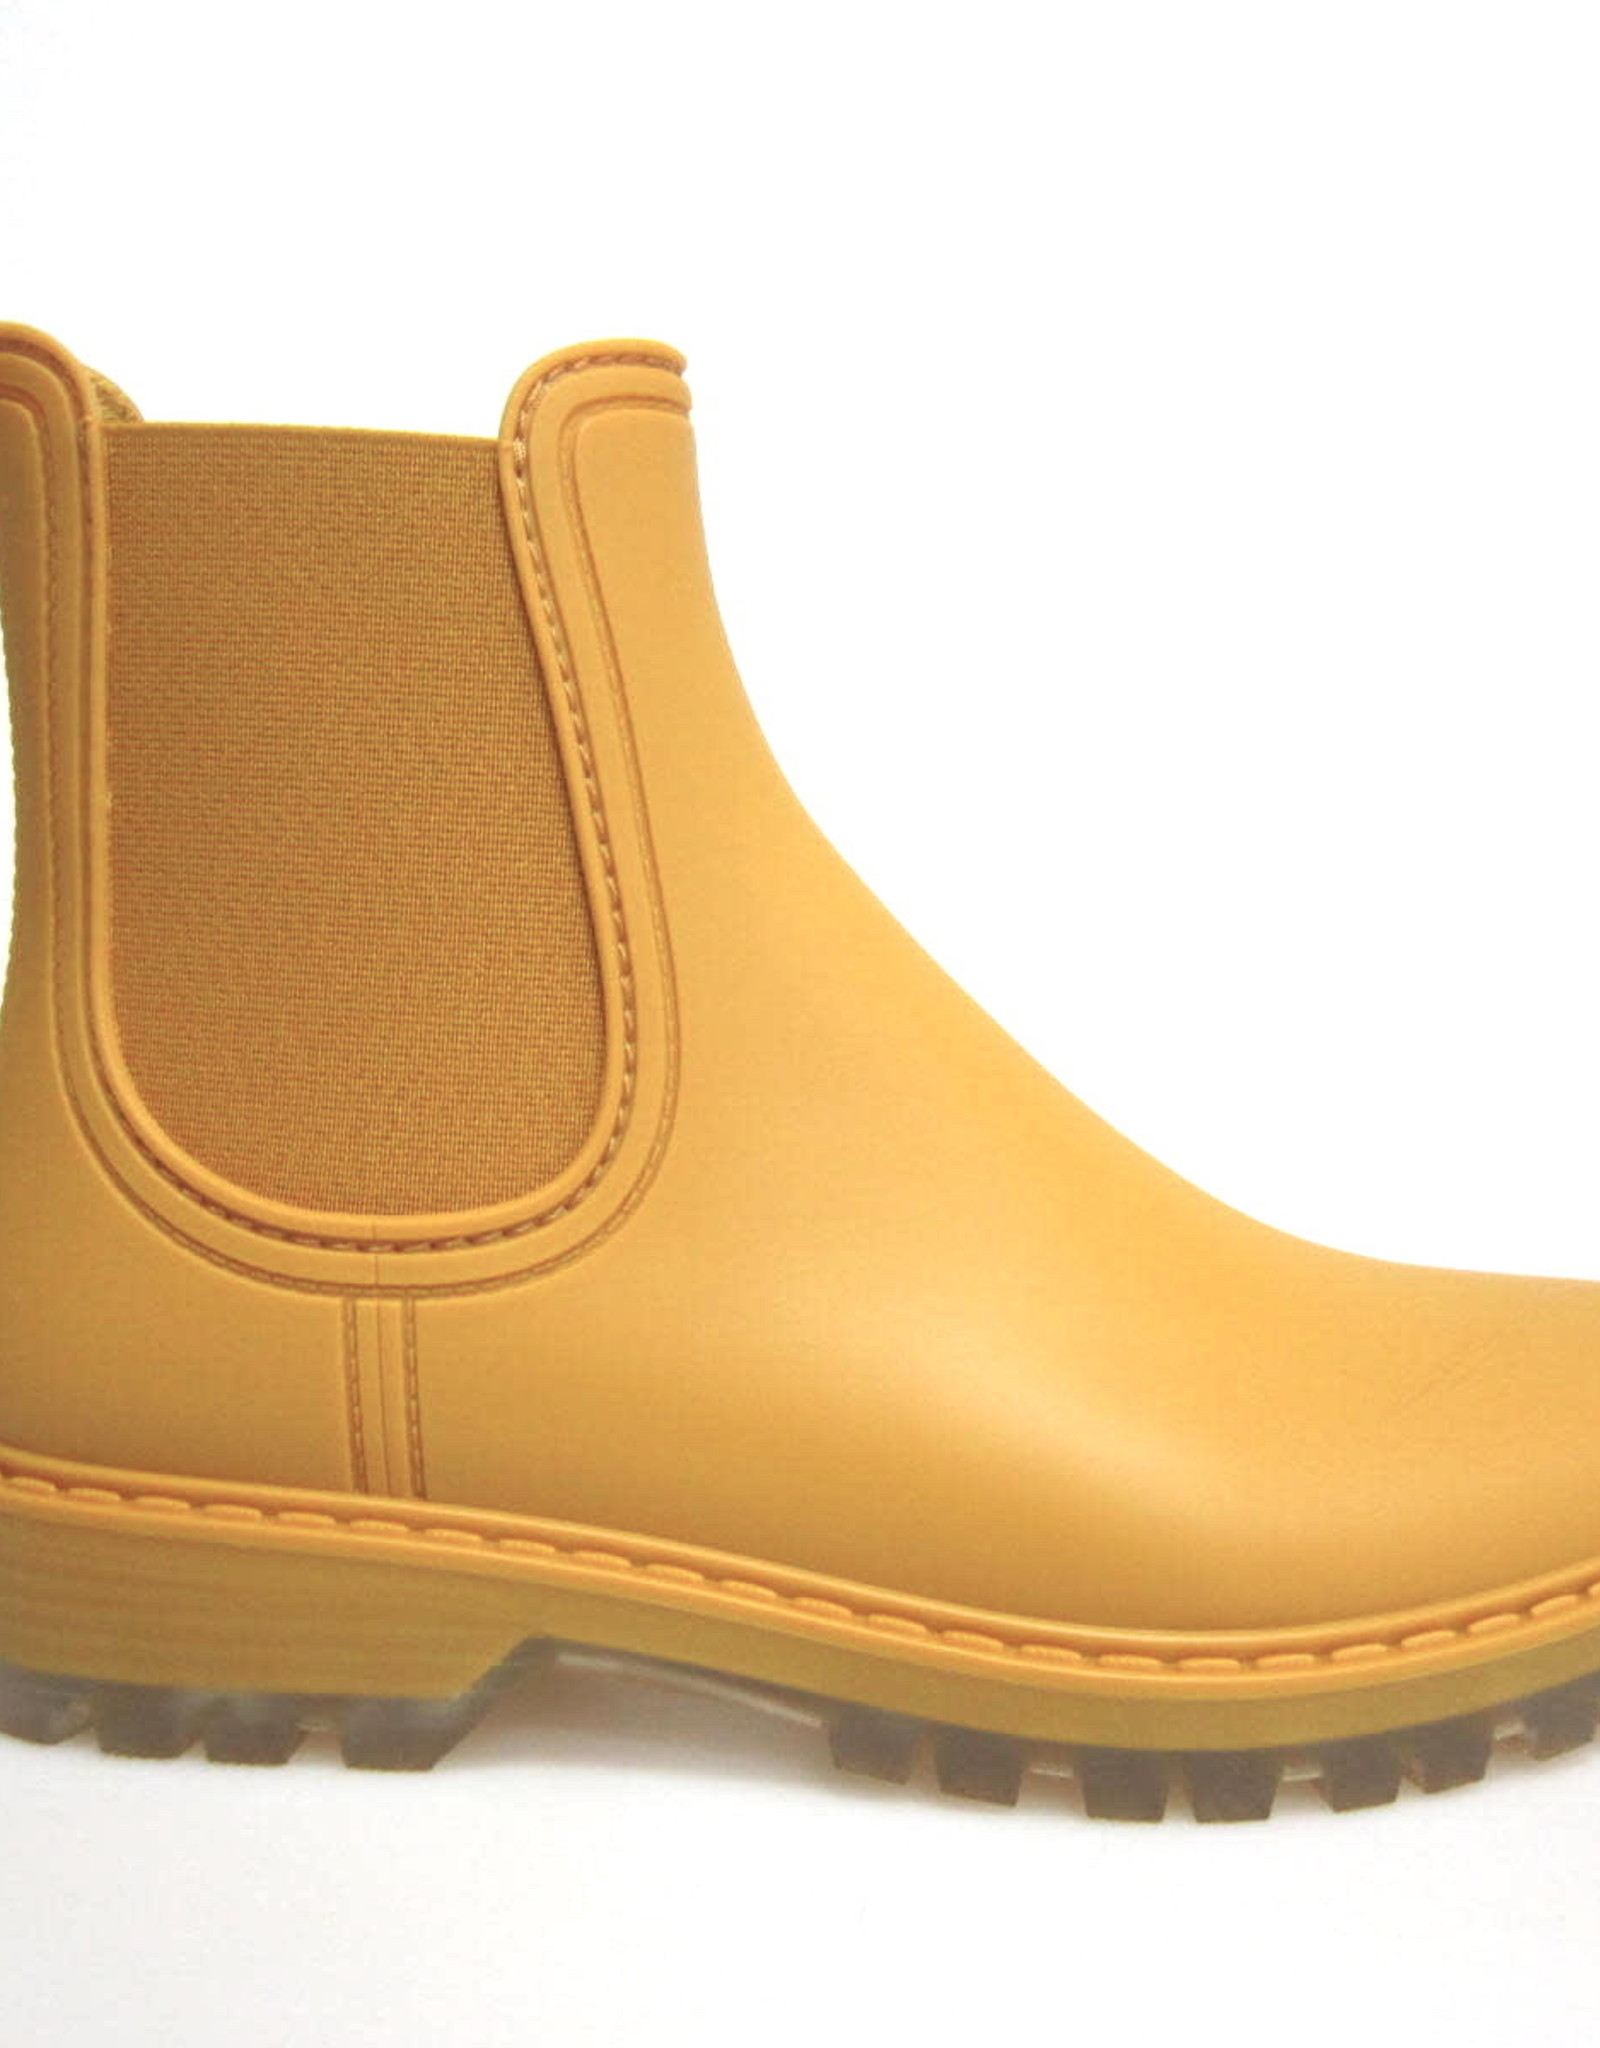 TONI PONS Coney Rain Boot